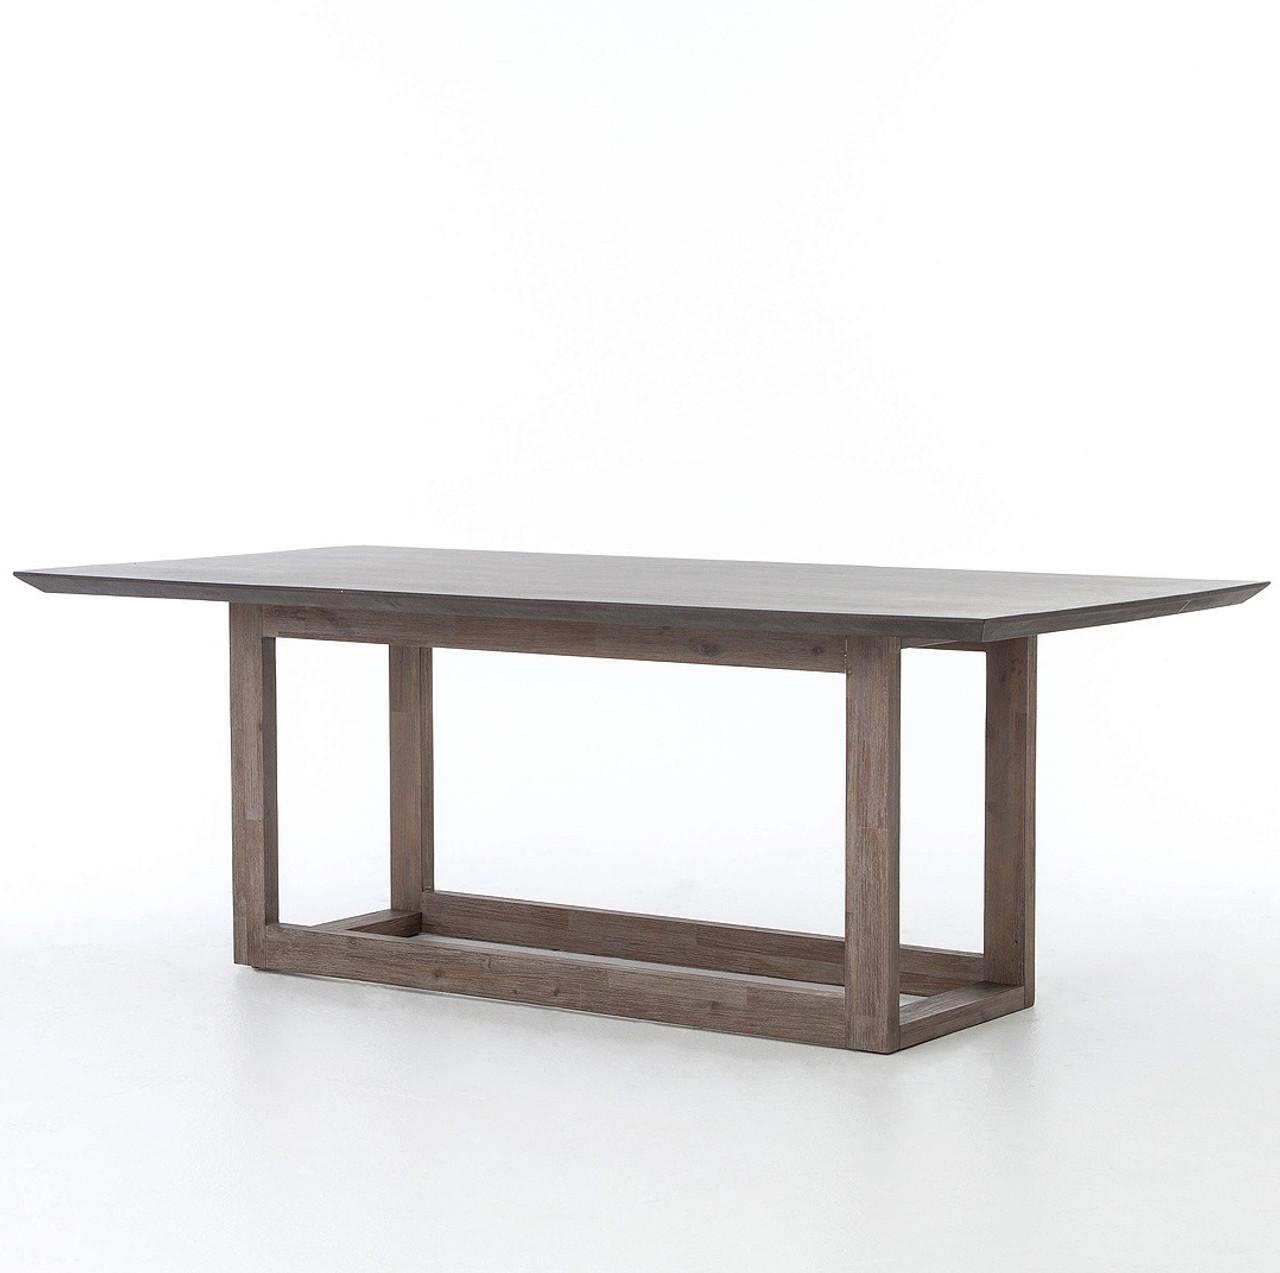 Masonry Wood And Black Concrete Dining Table 79u201d